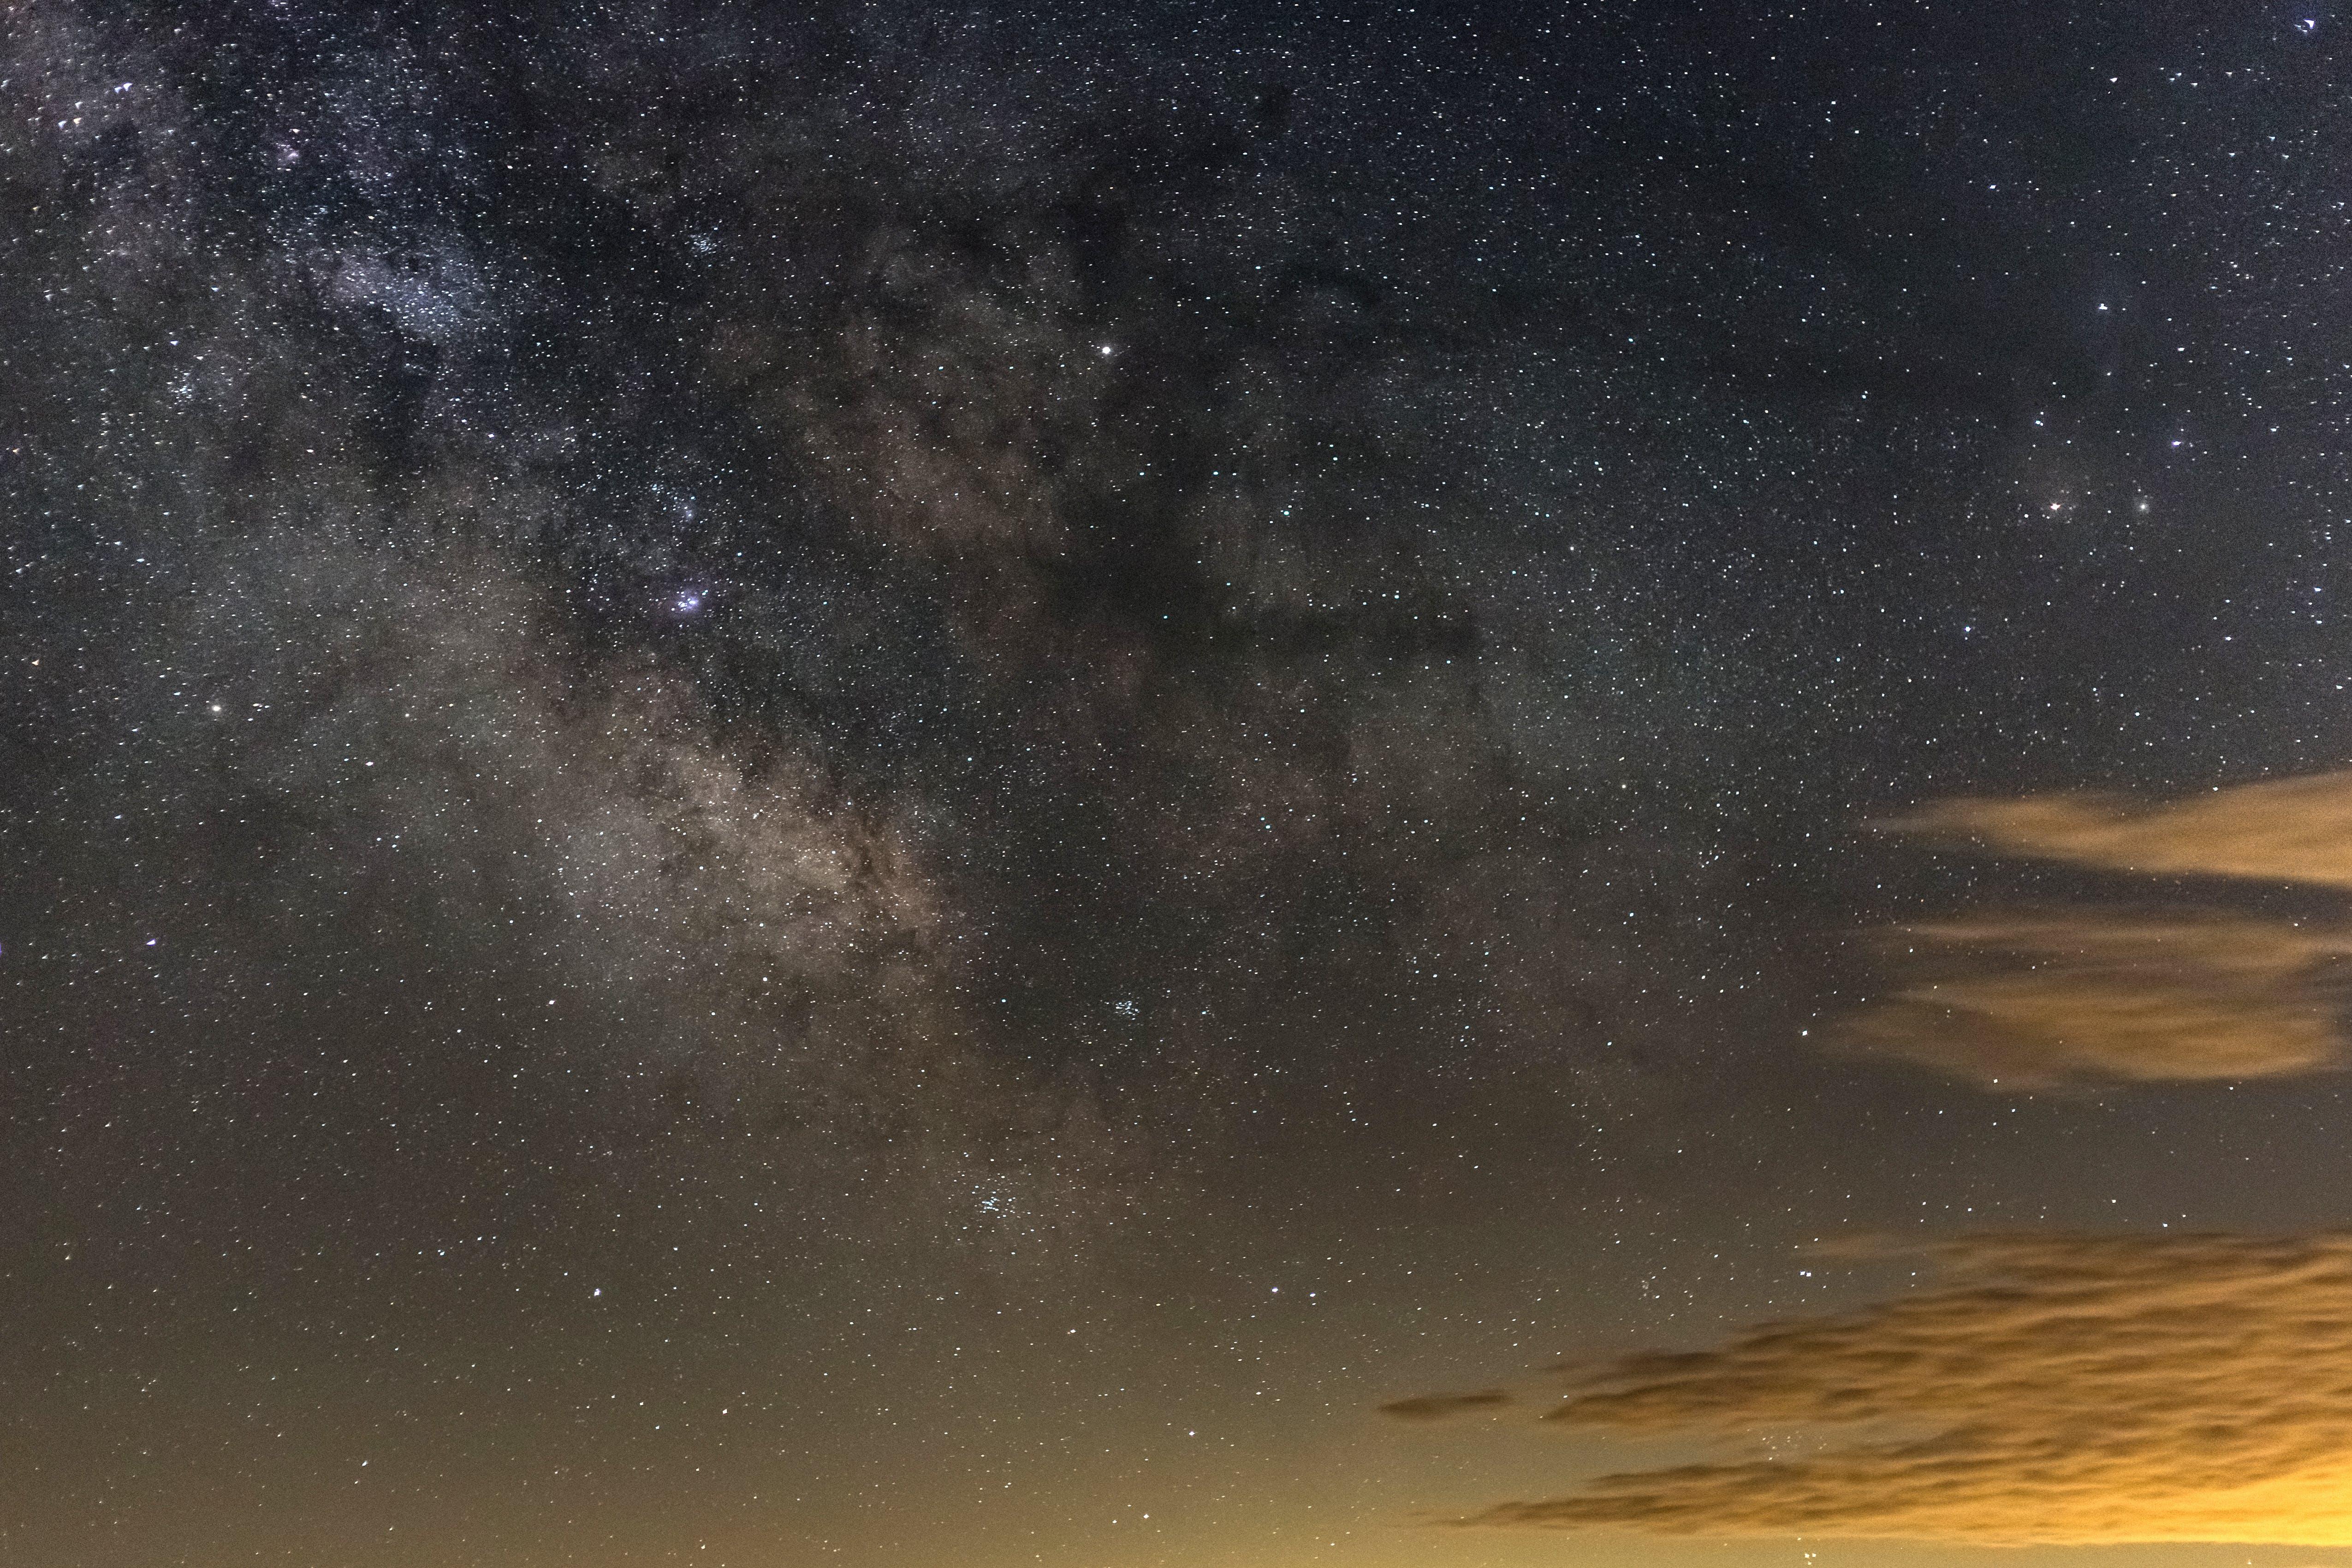 Kostenloses Stock Foto zu astrologie, astronomie, dunkel, galaxie